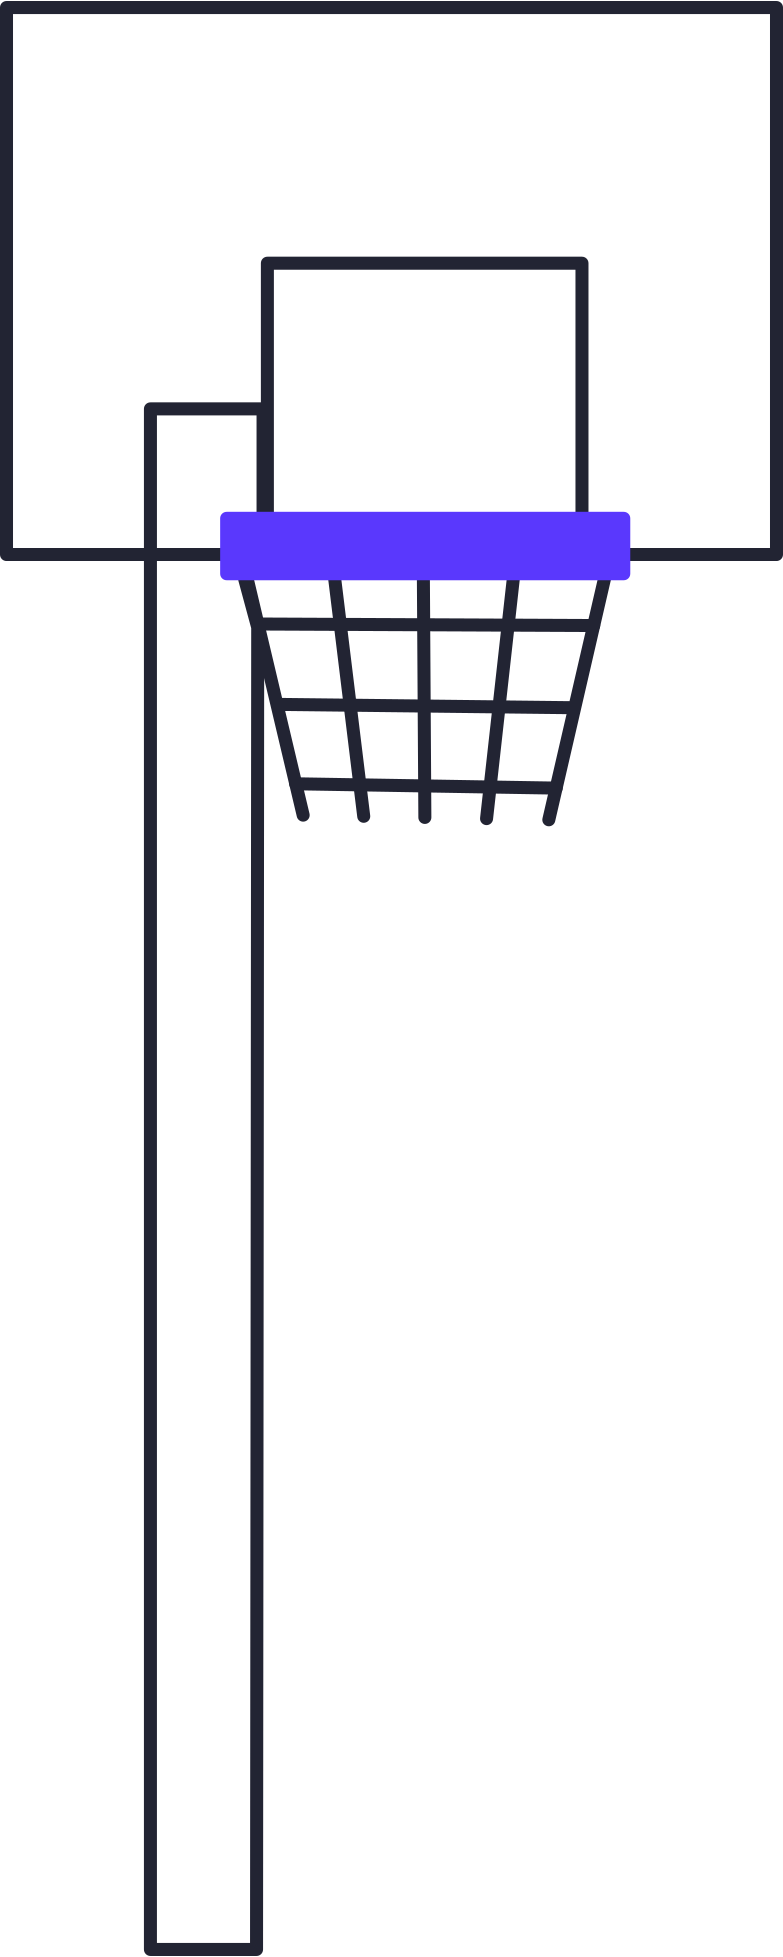 basketball  basketball hoop Clipart illustration in PNG, SVG